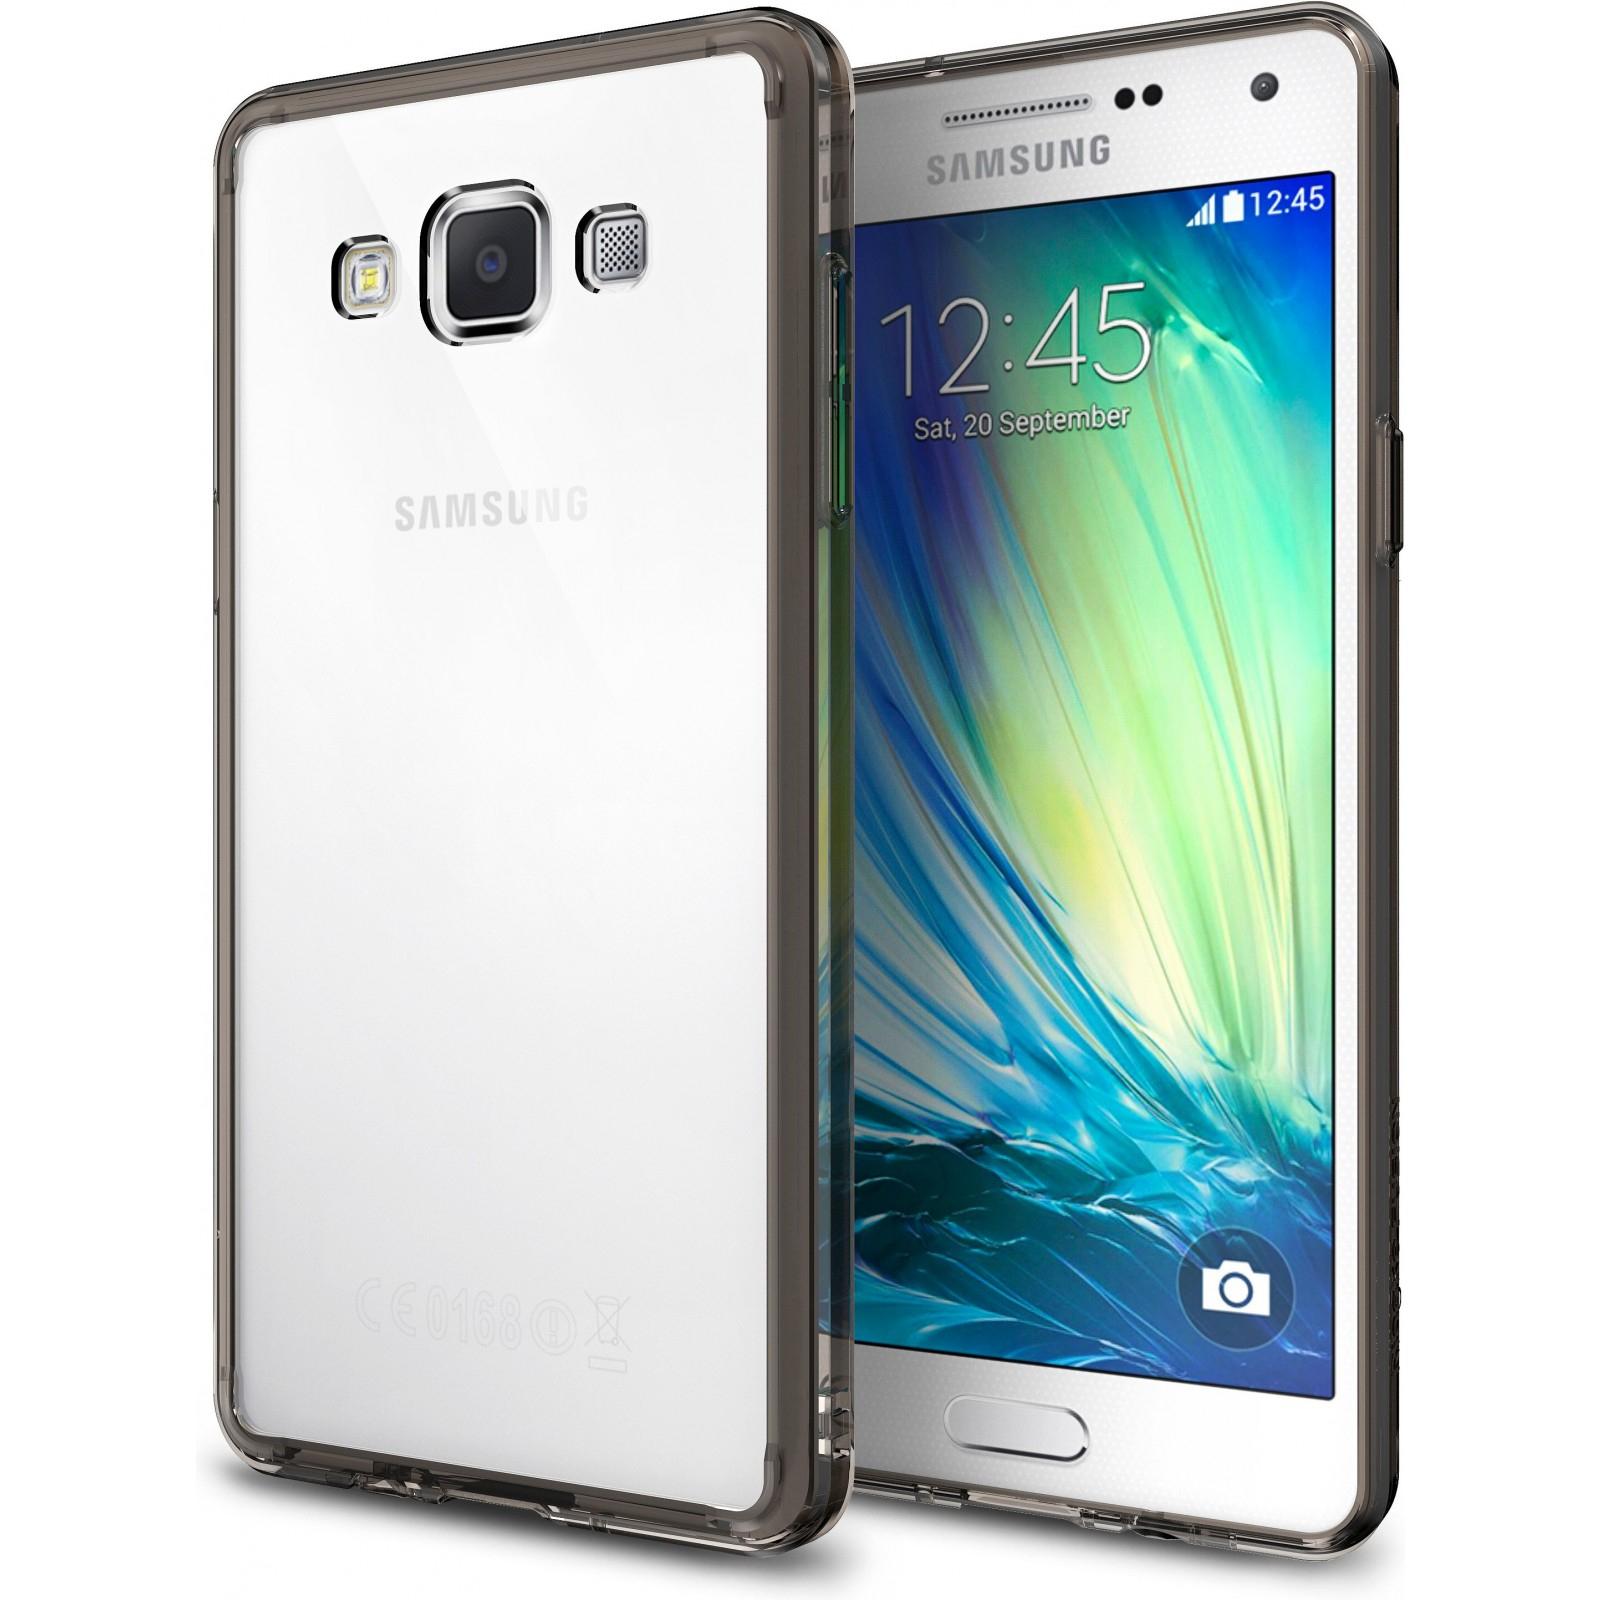 Чехол для моб. телефона Ringke Fusion для Samsung Galaxy A7 (Smoke Black) (556922)